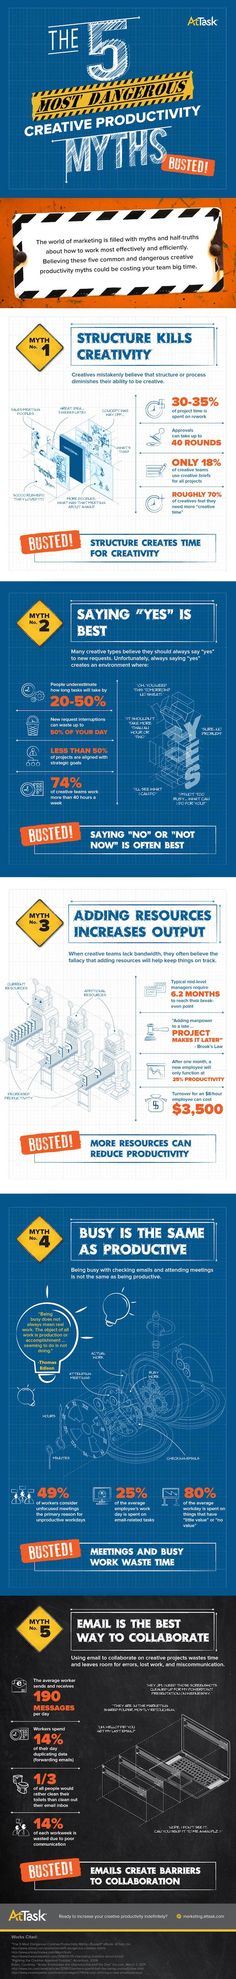 Infographic: The 5 Most Dangerous Creative Productivity Myths - DesignTAXI.com